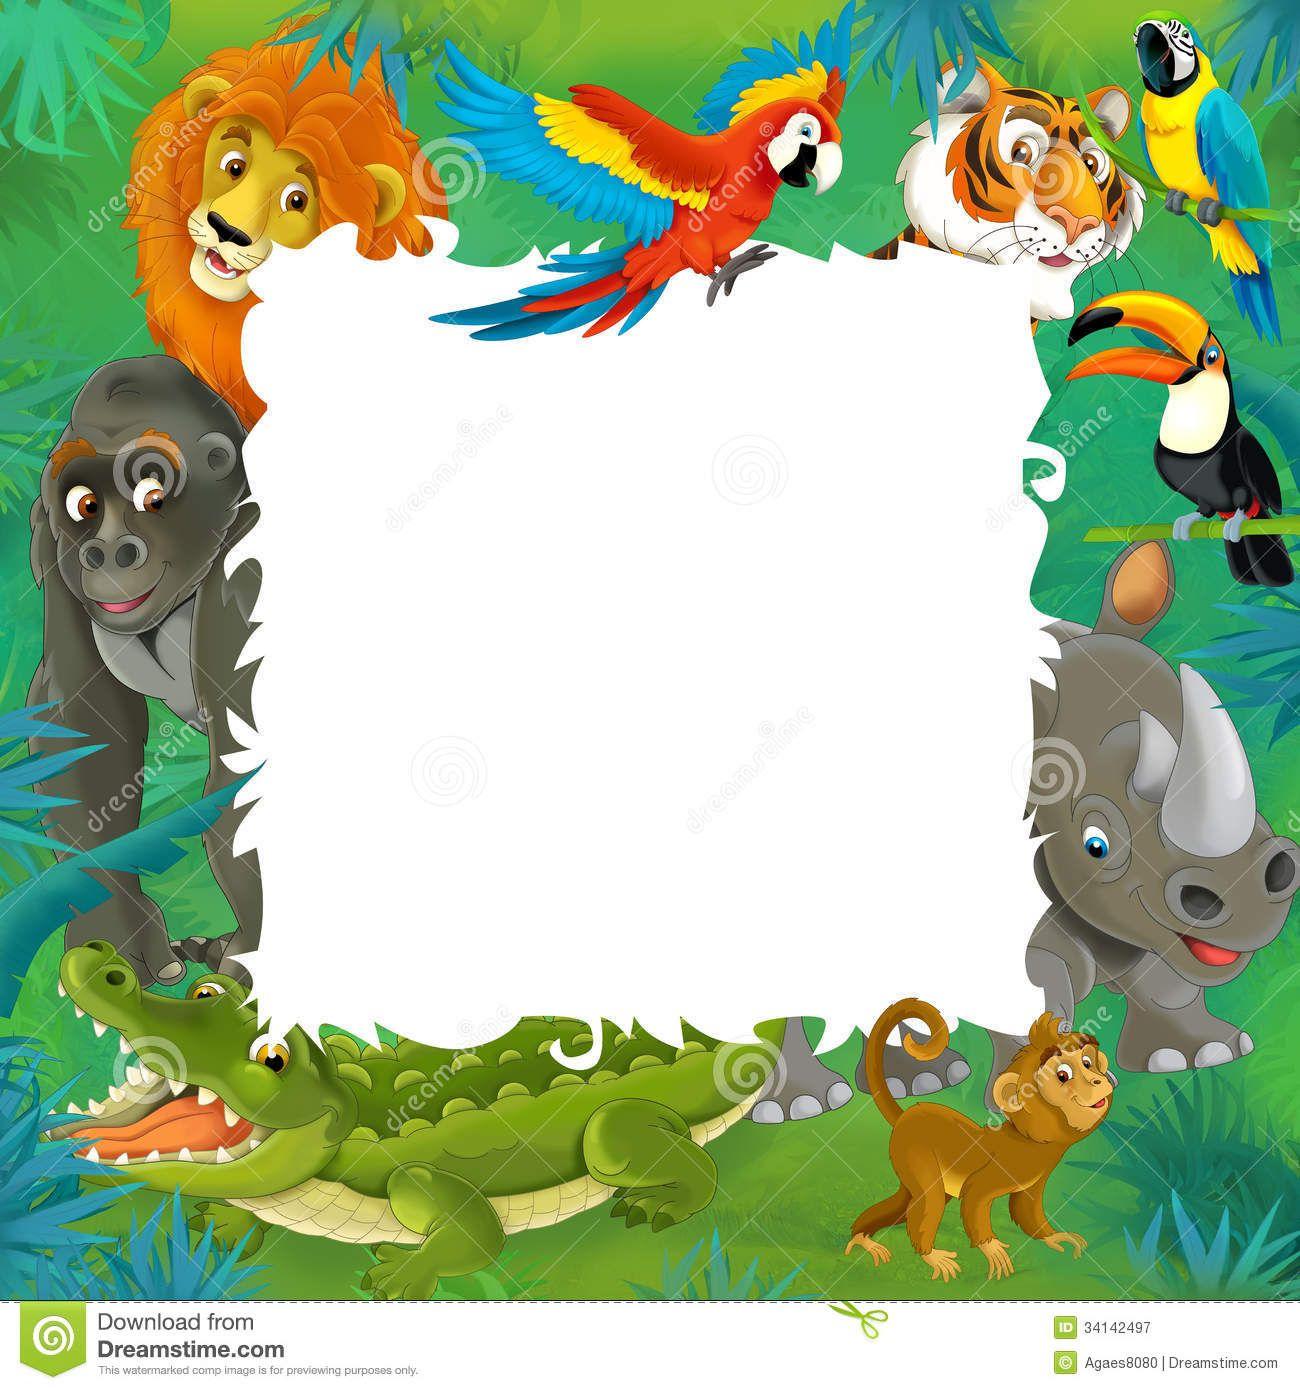 templates of jungle animals.